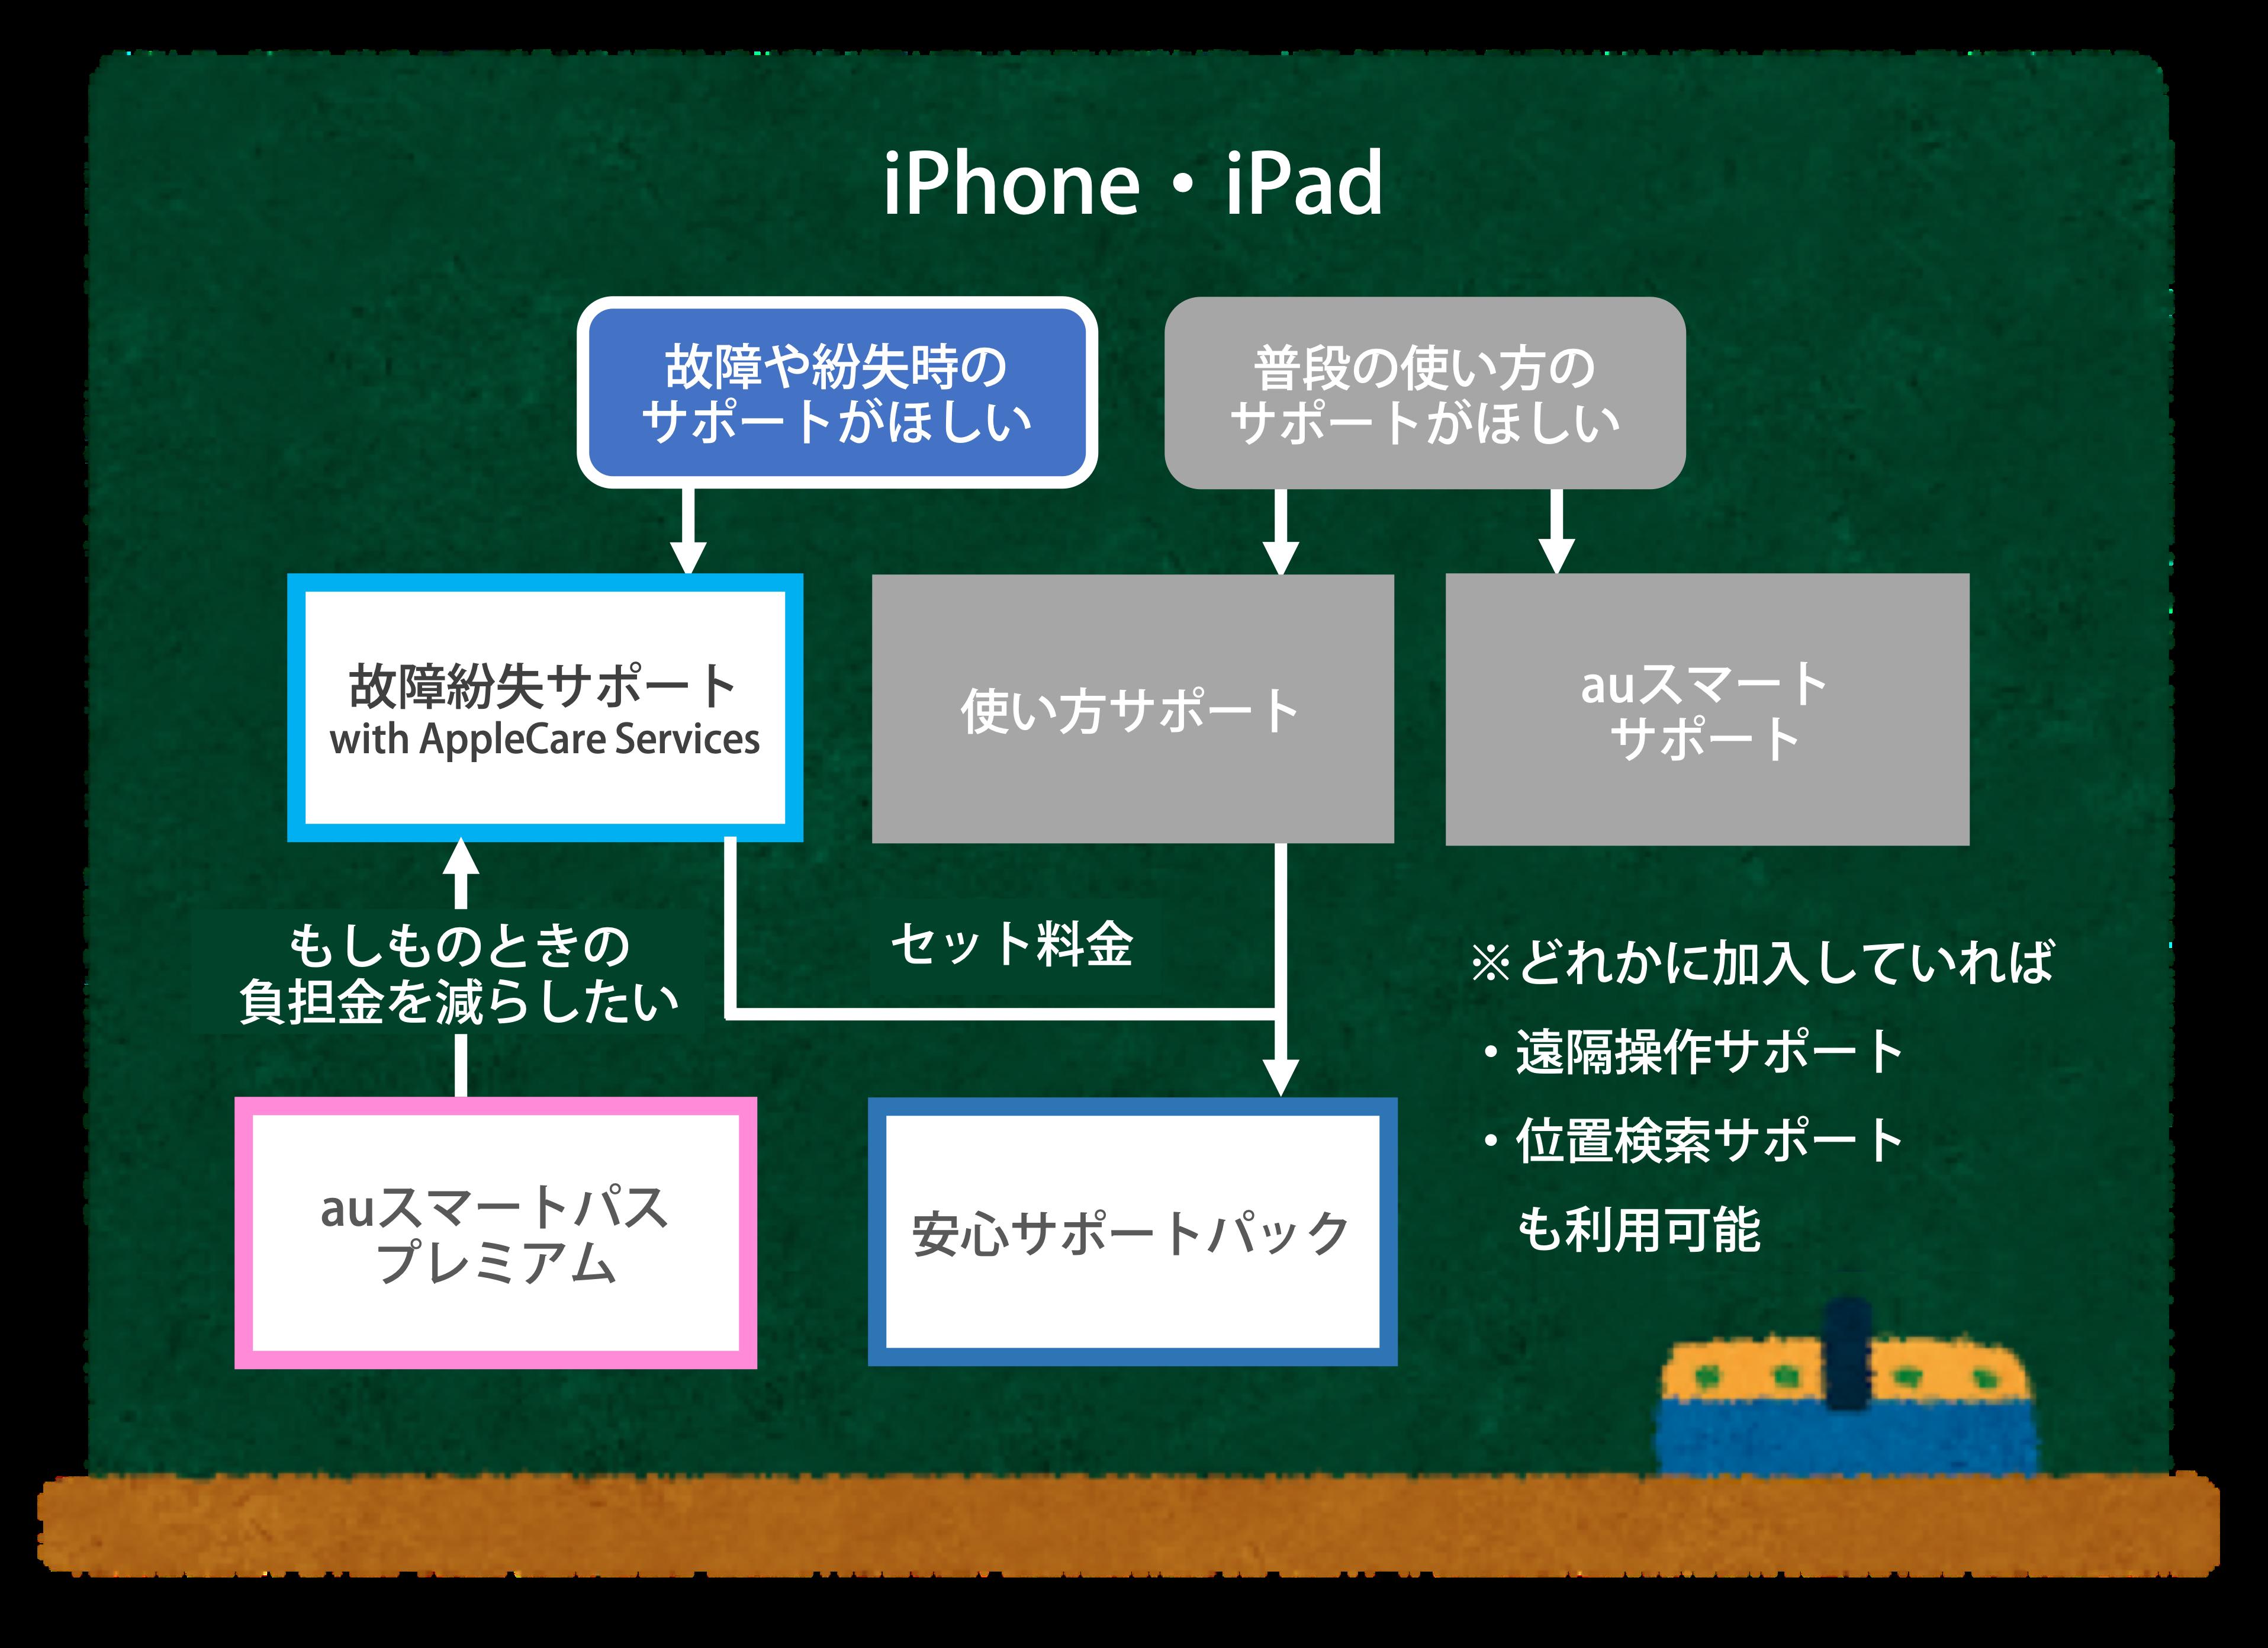 auサポートサービス(iPhone用)のフロー図